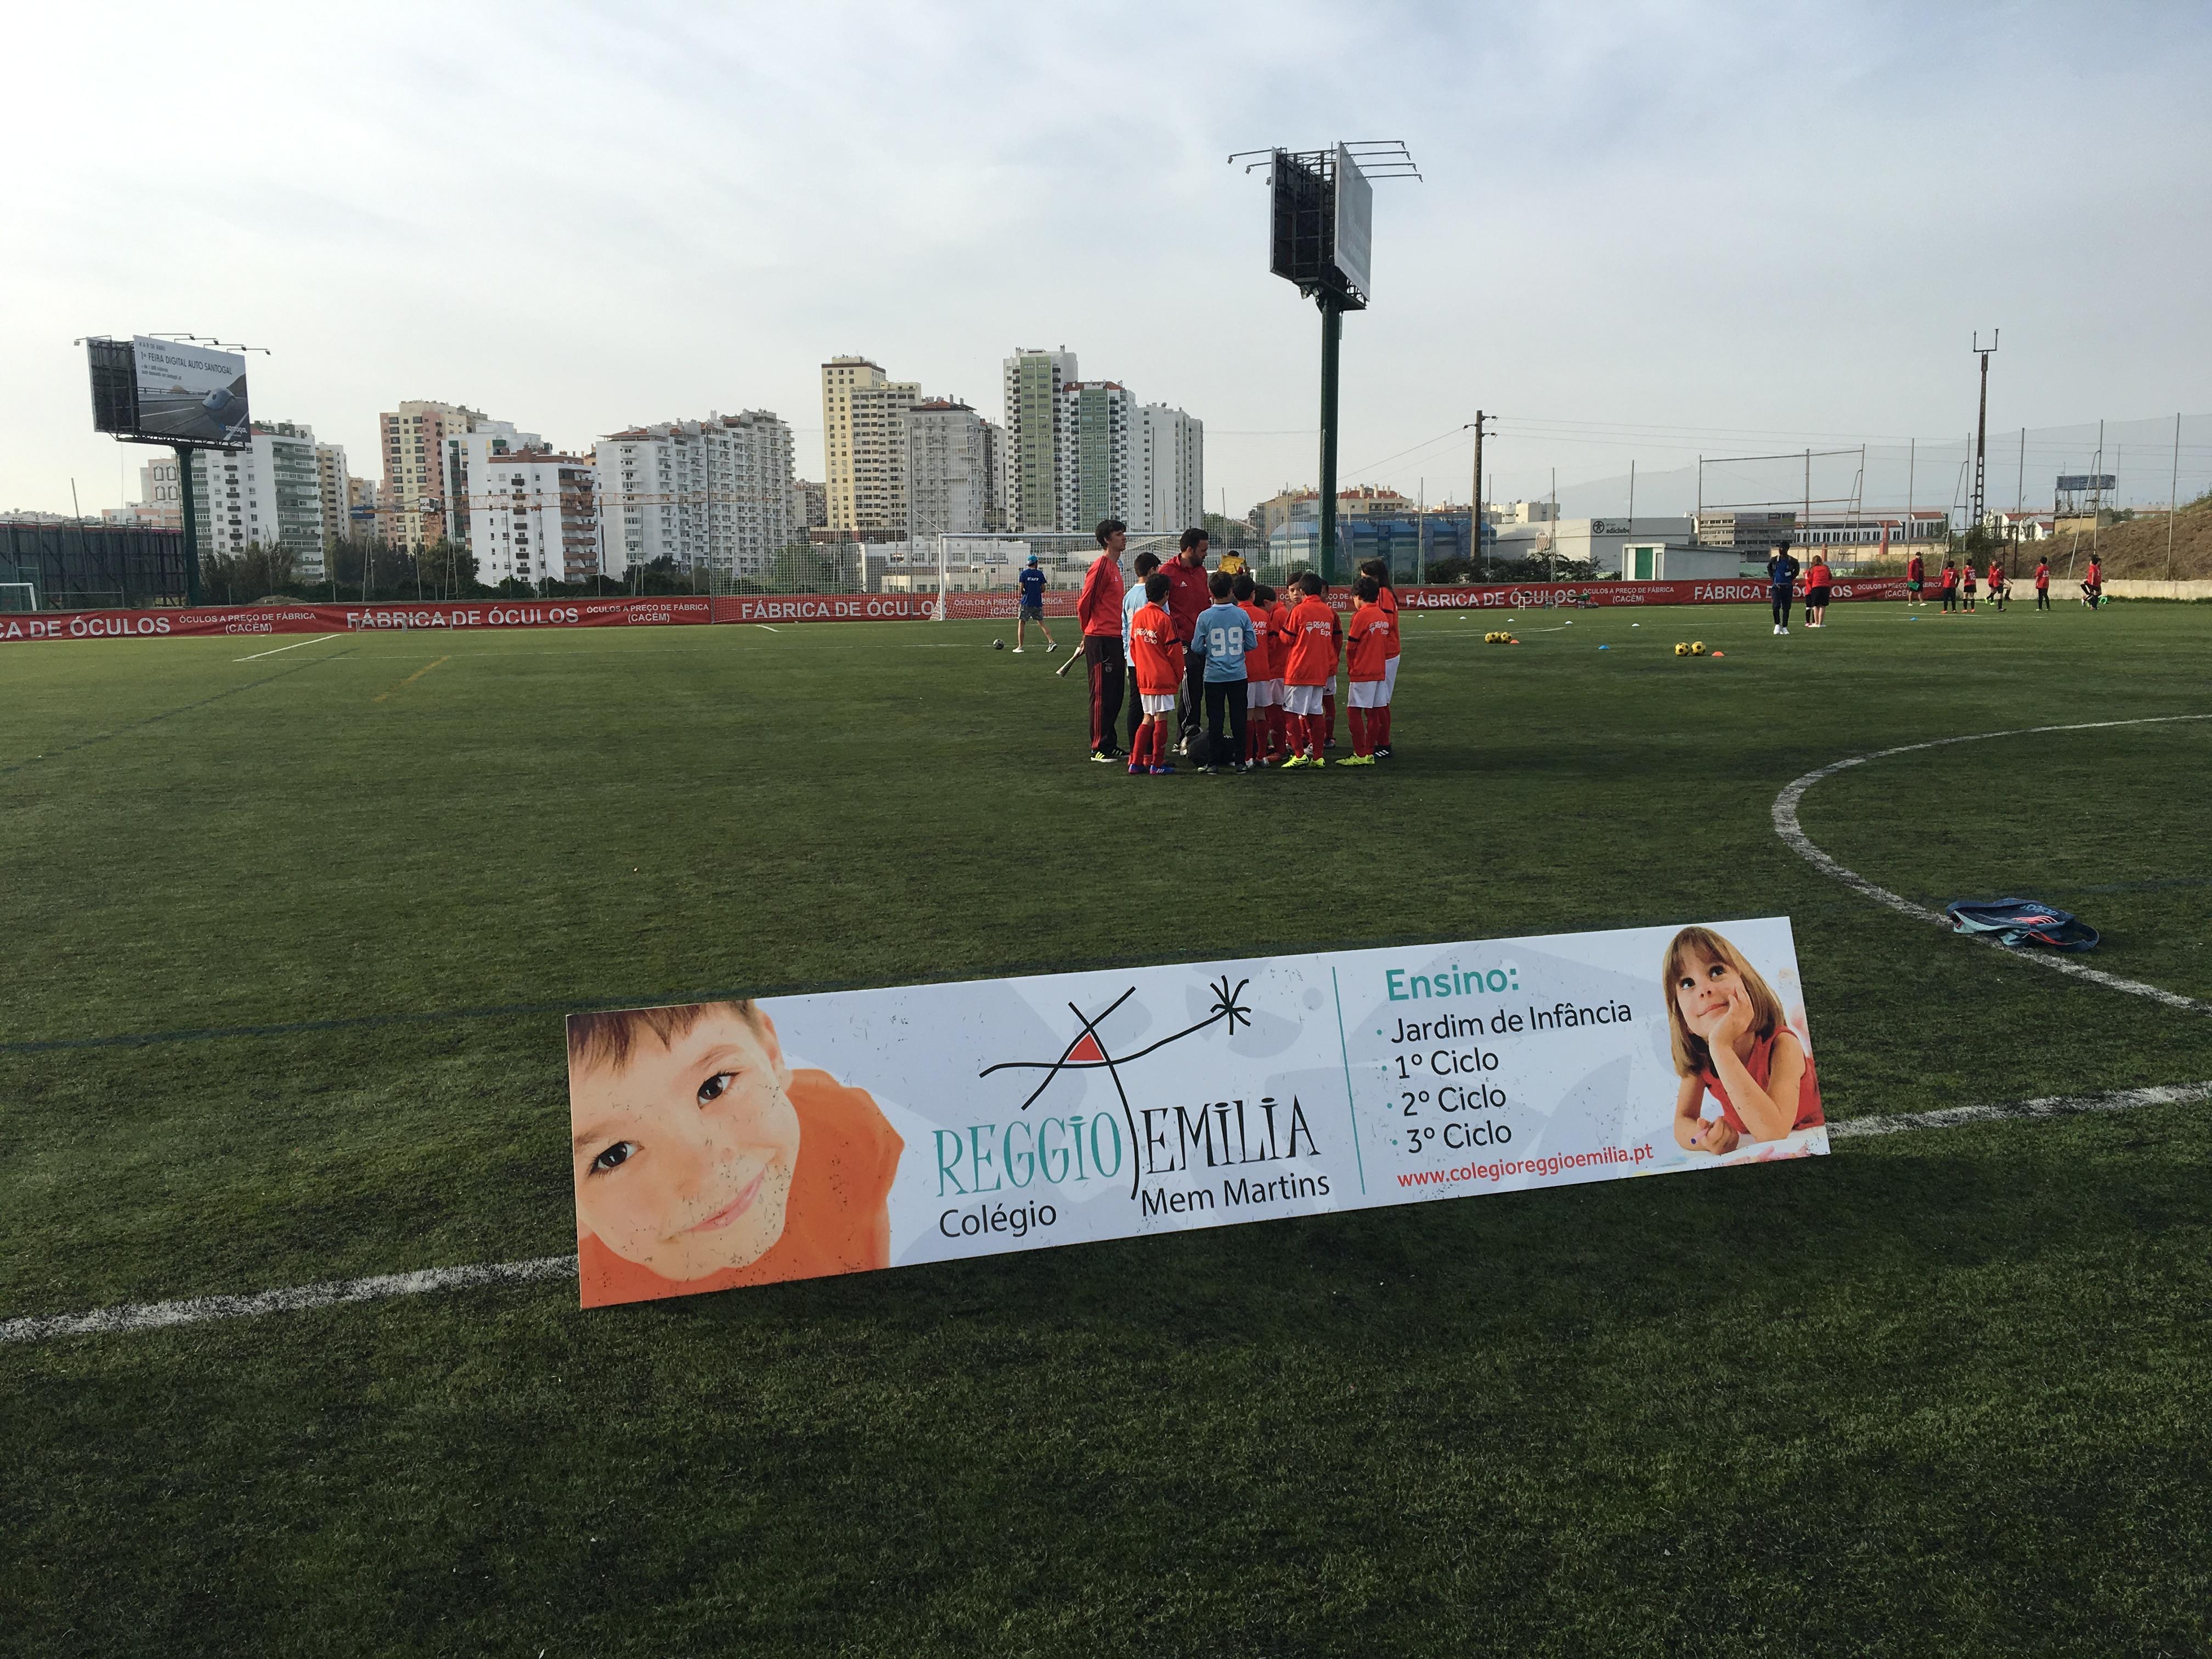 Petizes Reggio Emilia no Damaiense Páscoa Cup 2017